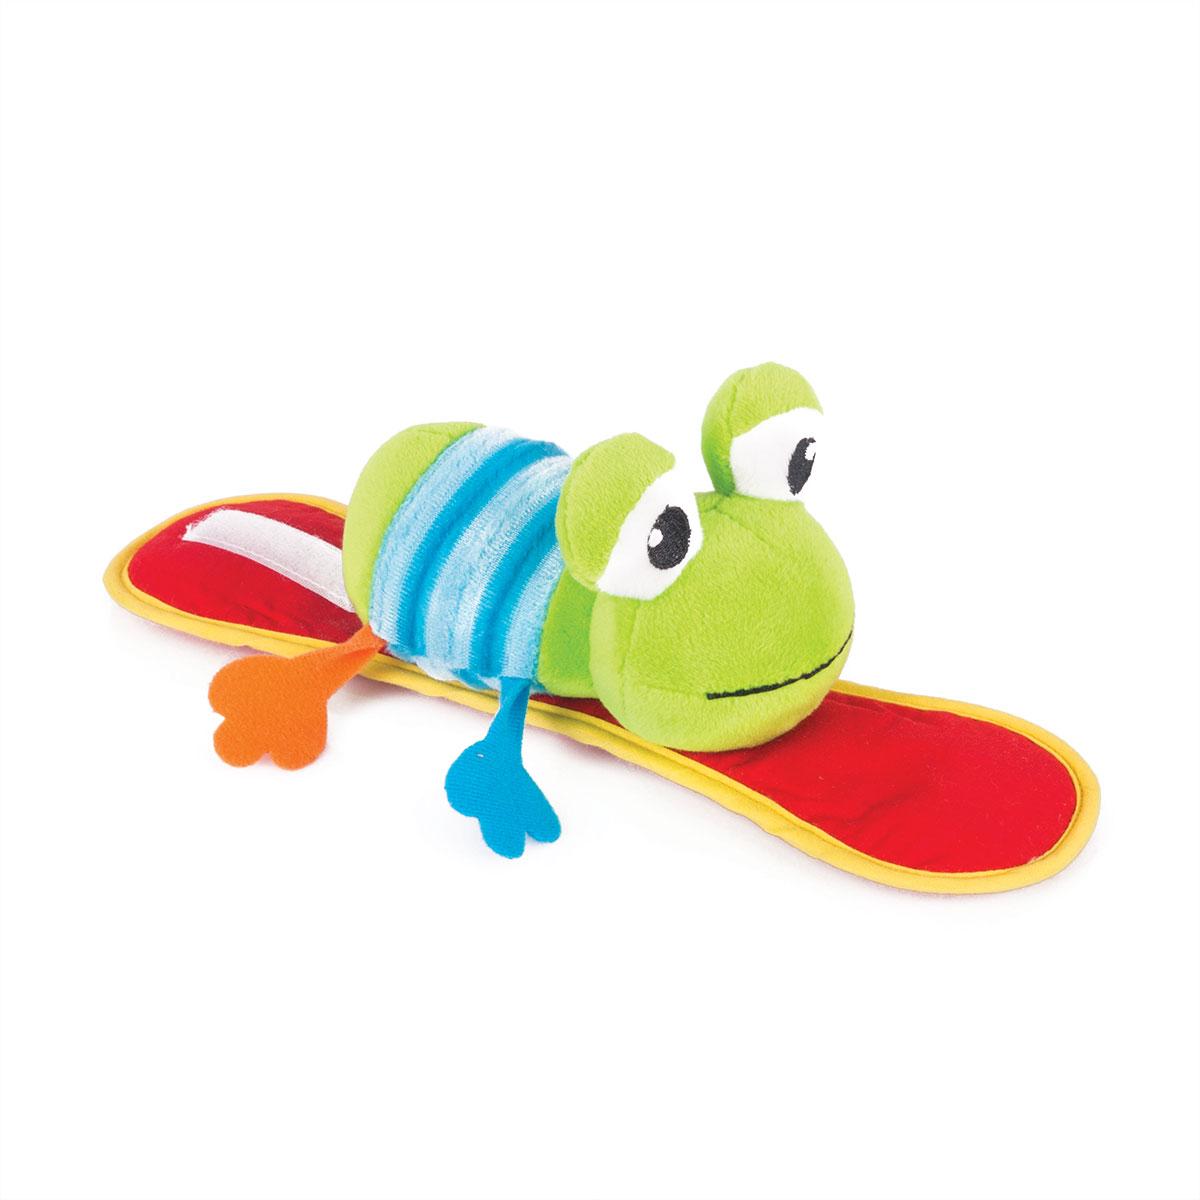 Happy Snail Развивающая игрушка Лягушонок Квака